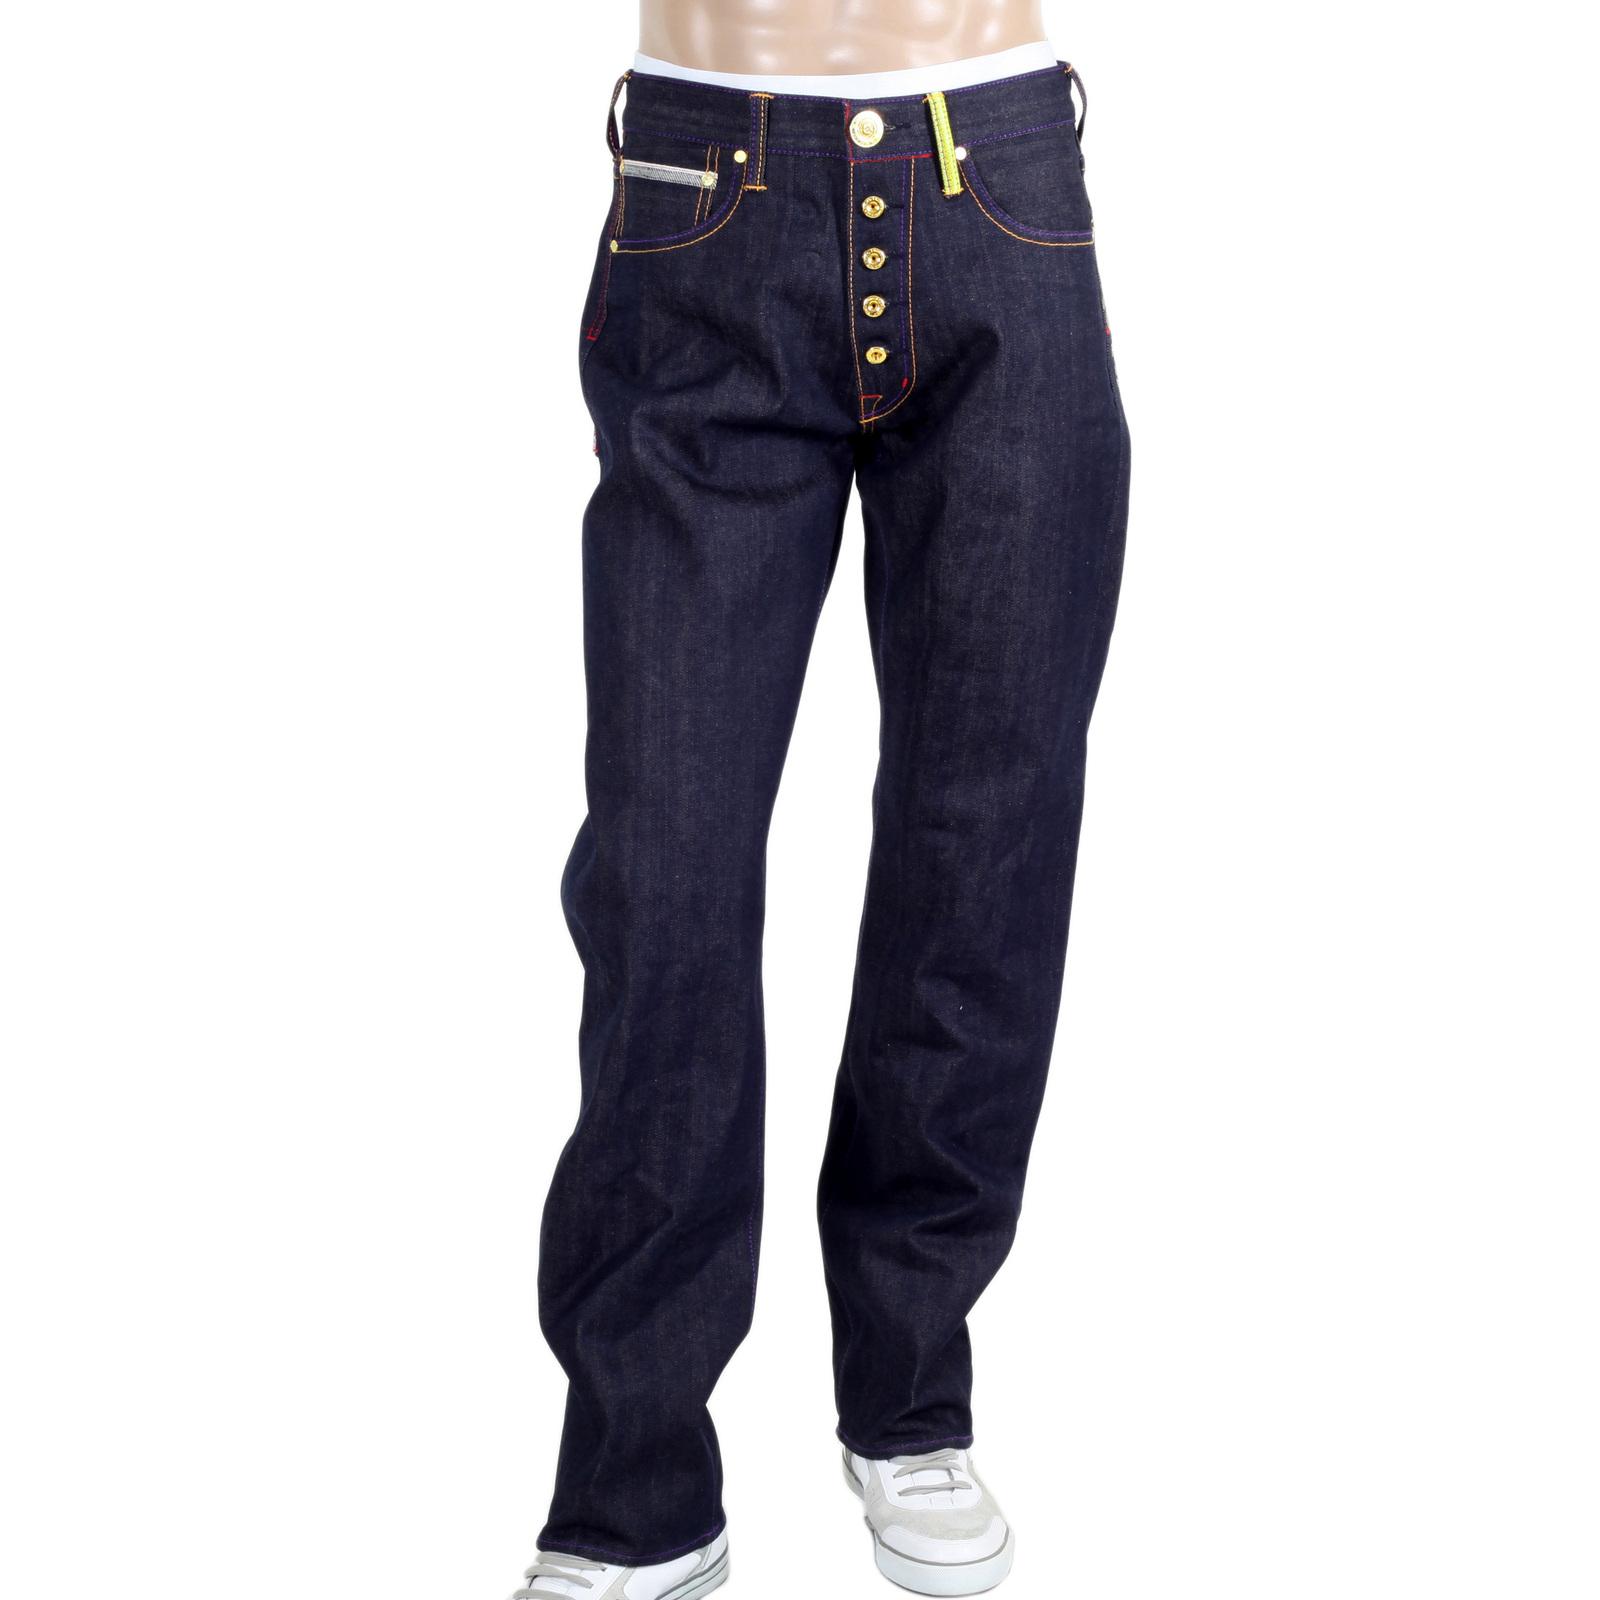 Shop for Selvedge Denim Jeans for Men by Yoropiko